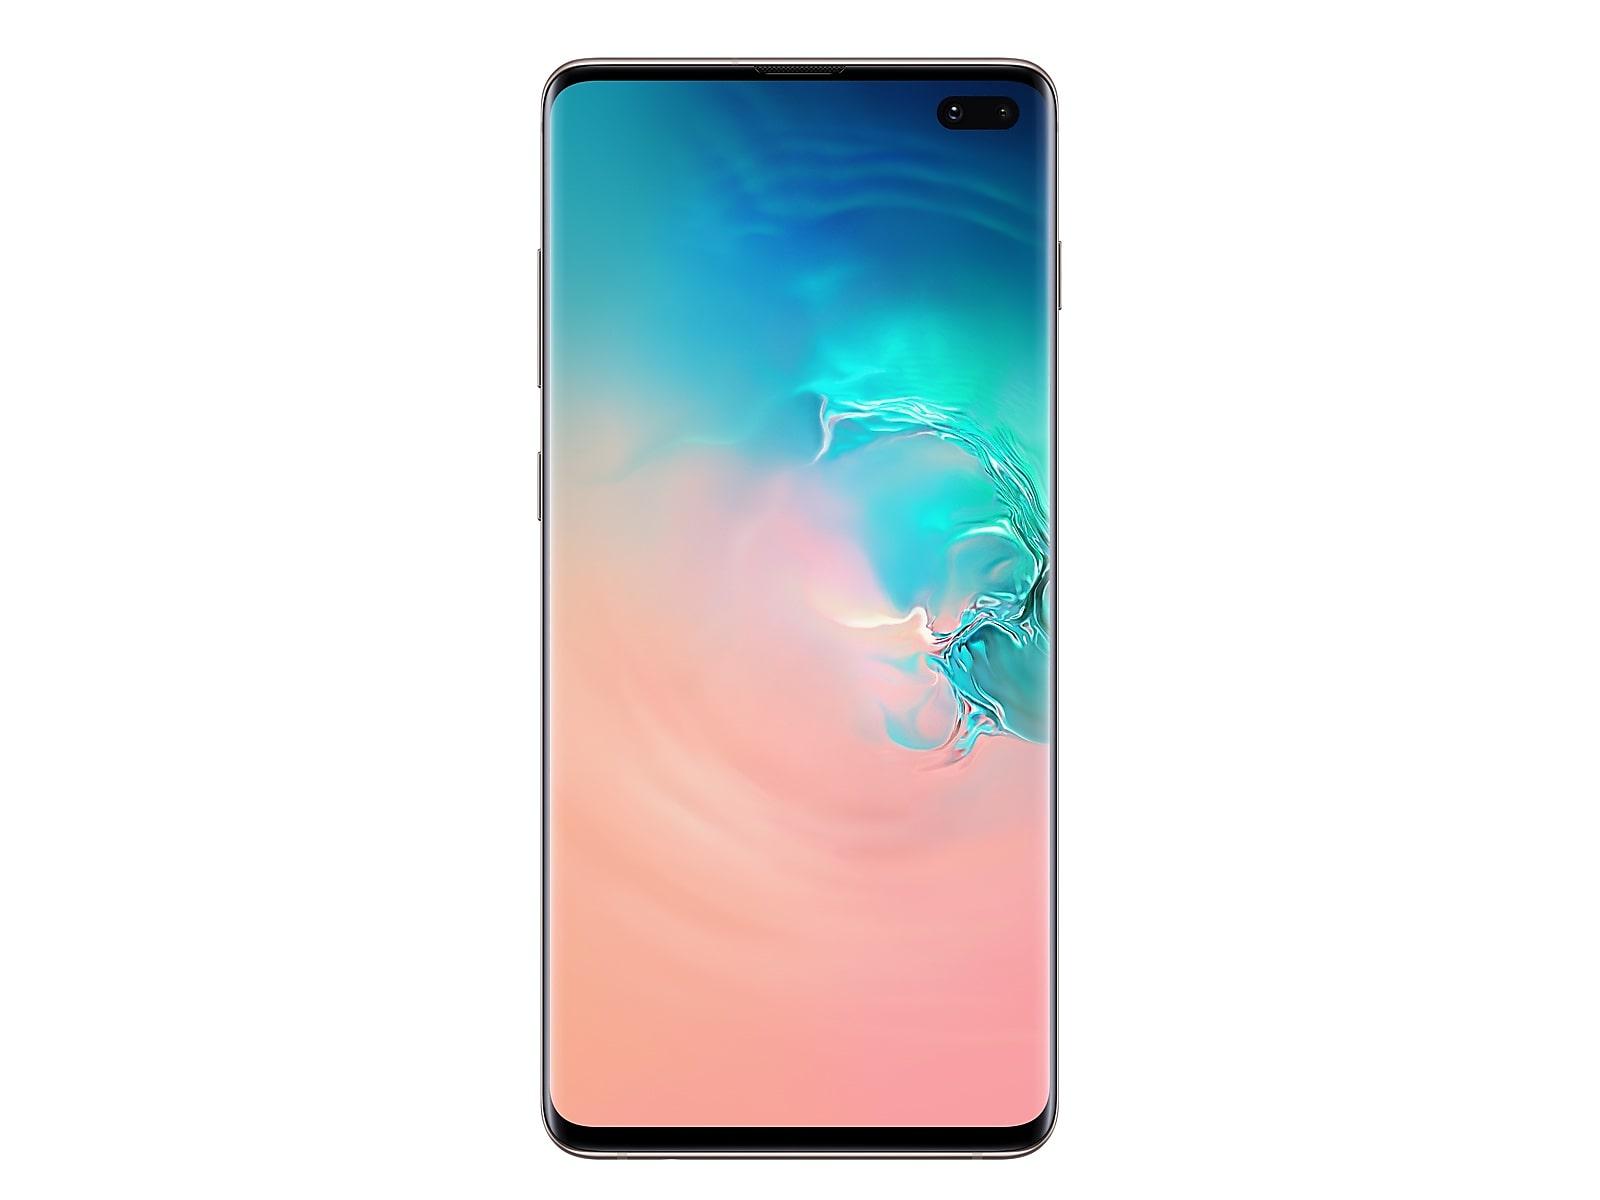 Samsung Galaxy S10+ 1TB in Ceramic White (US Cellular) (SM-G975UCWFUSC)